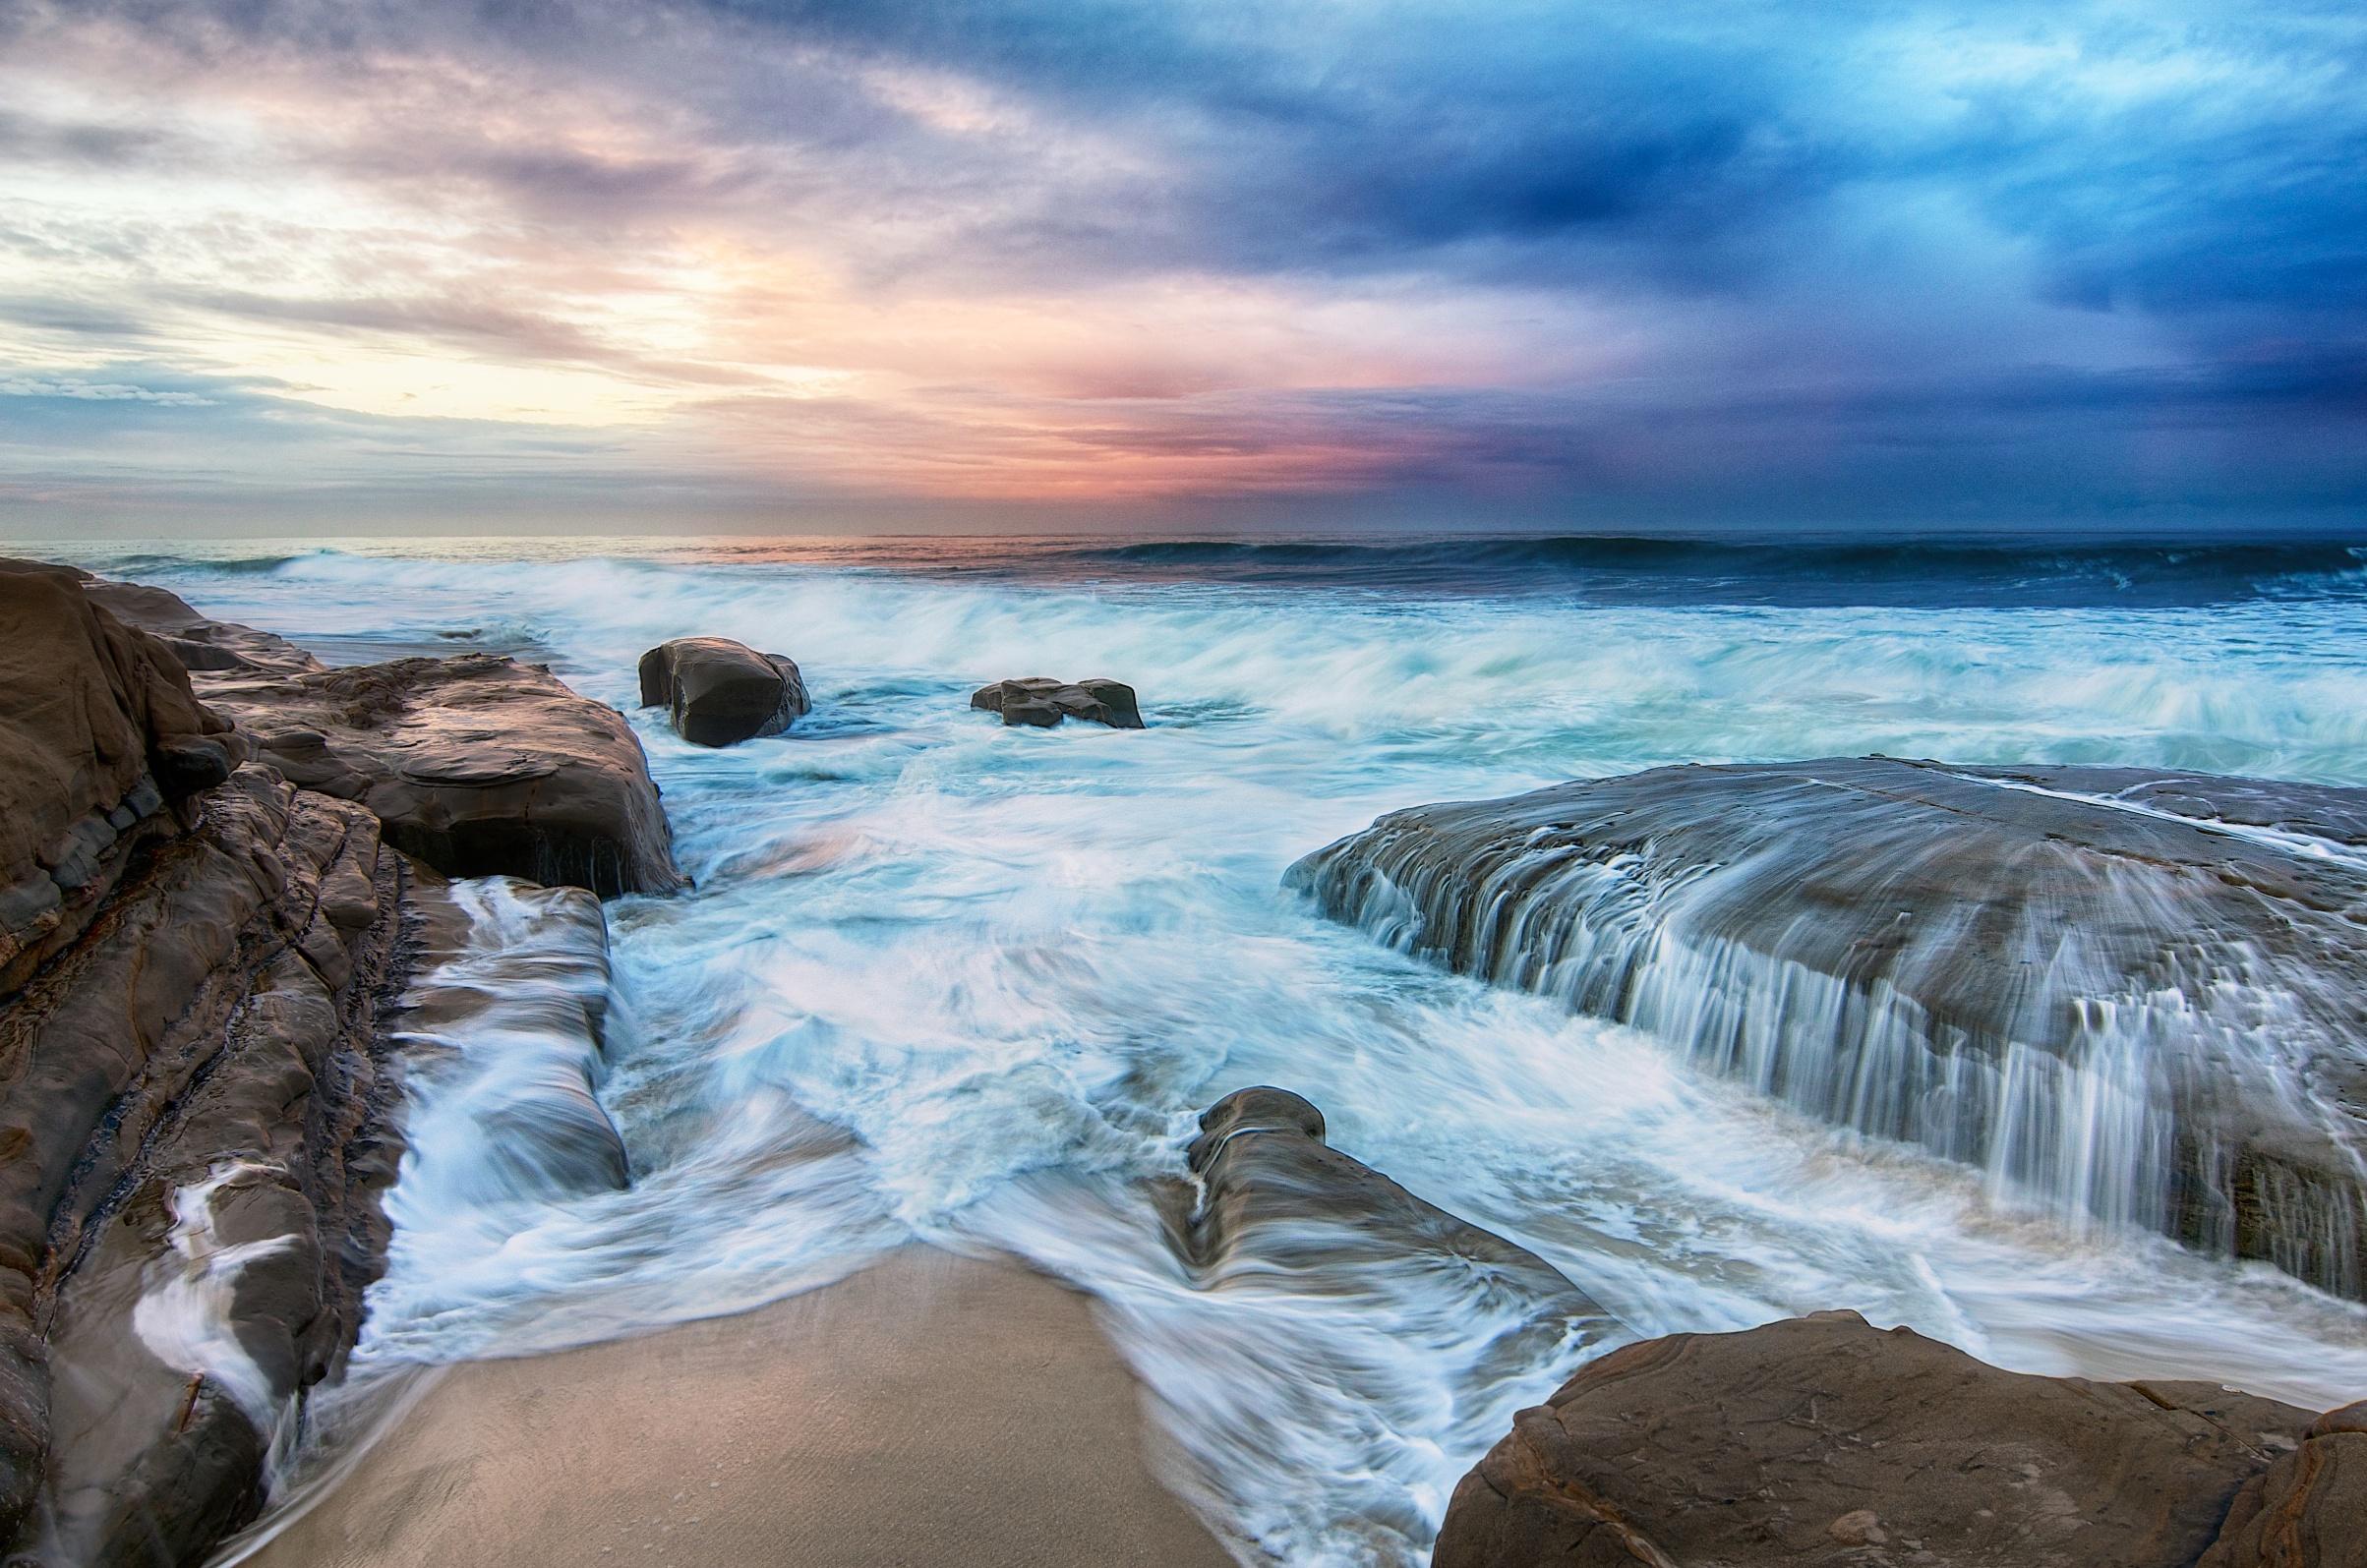 The Morning Tide, La Jolla